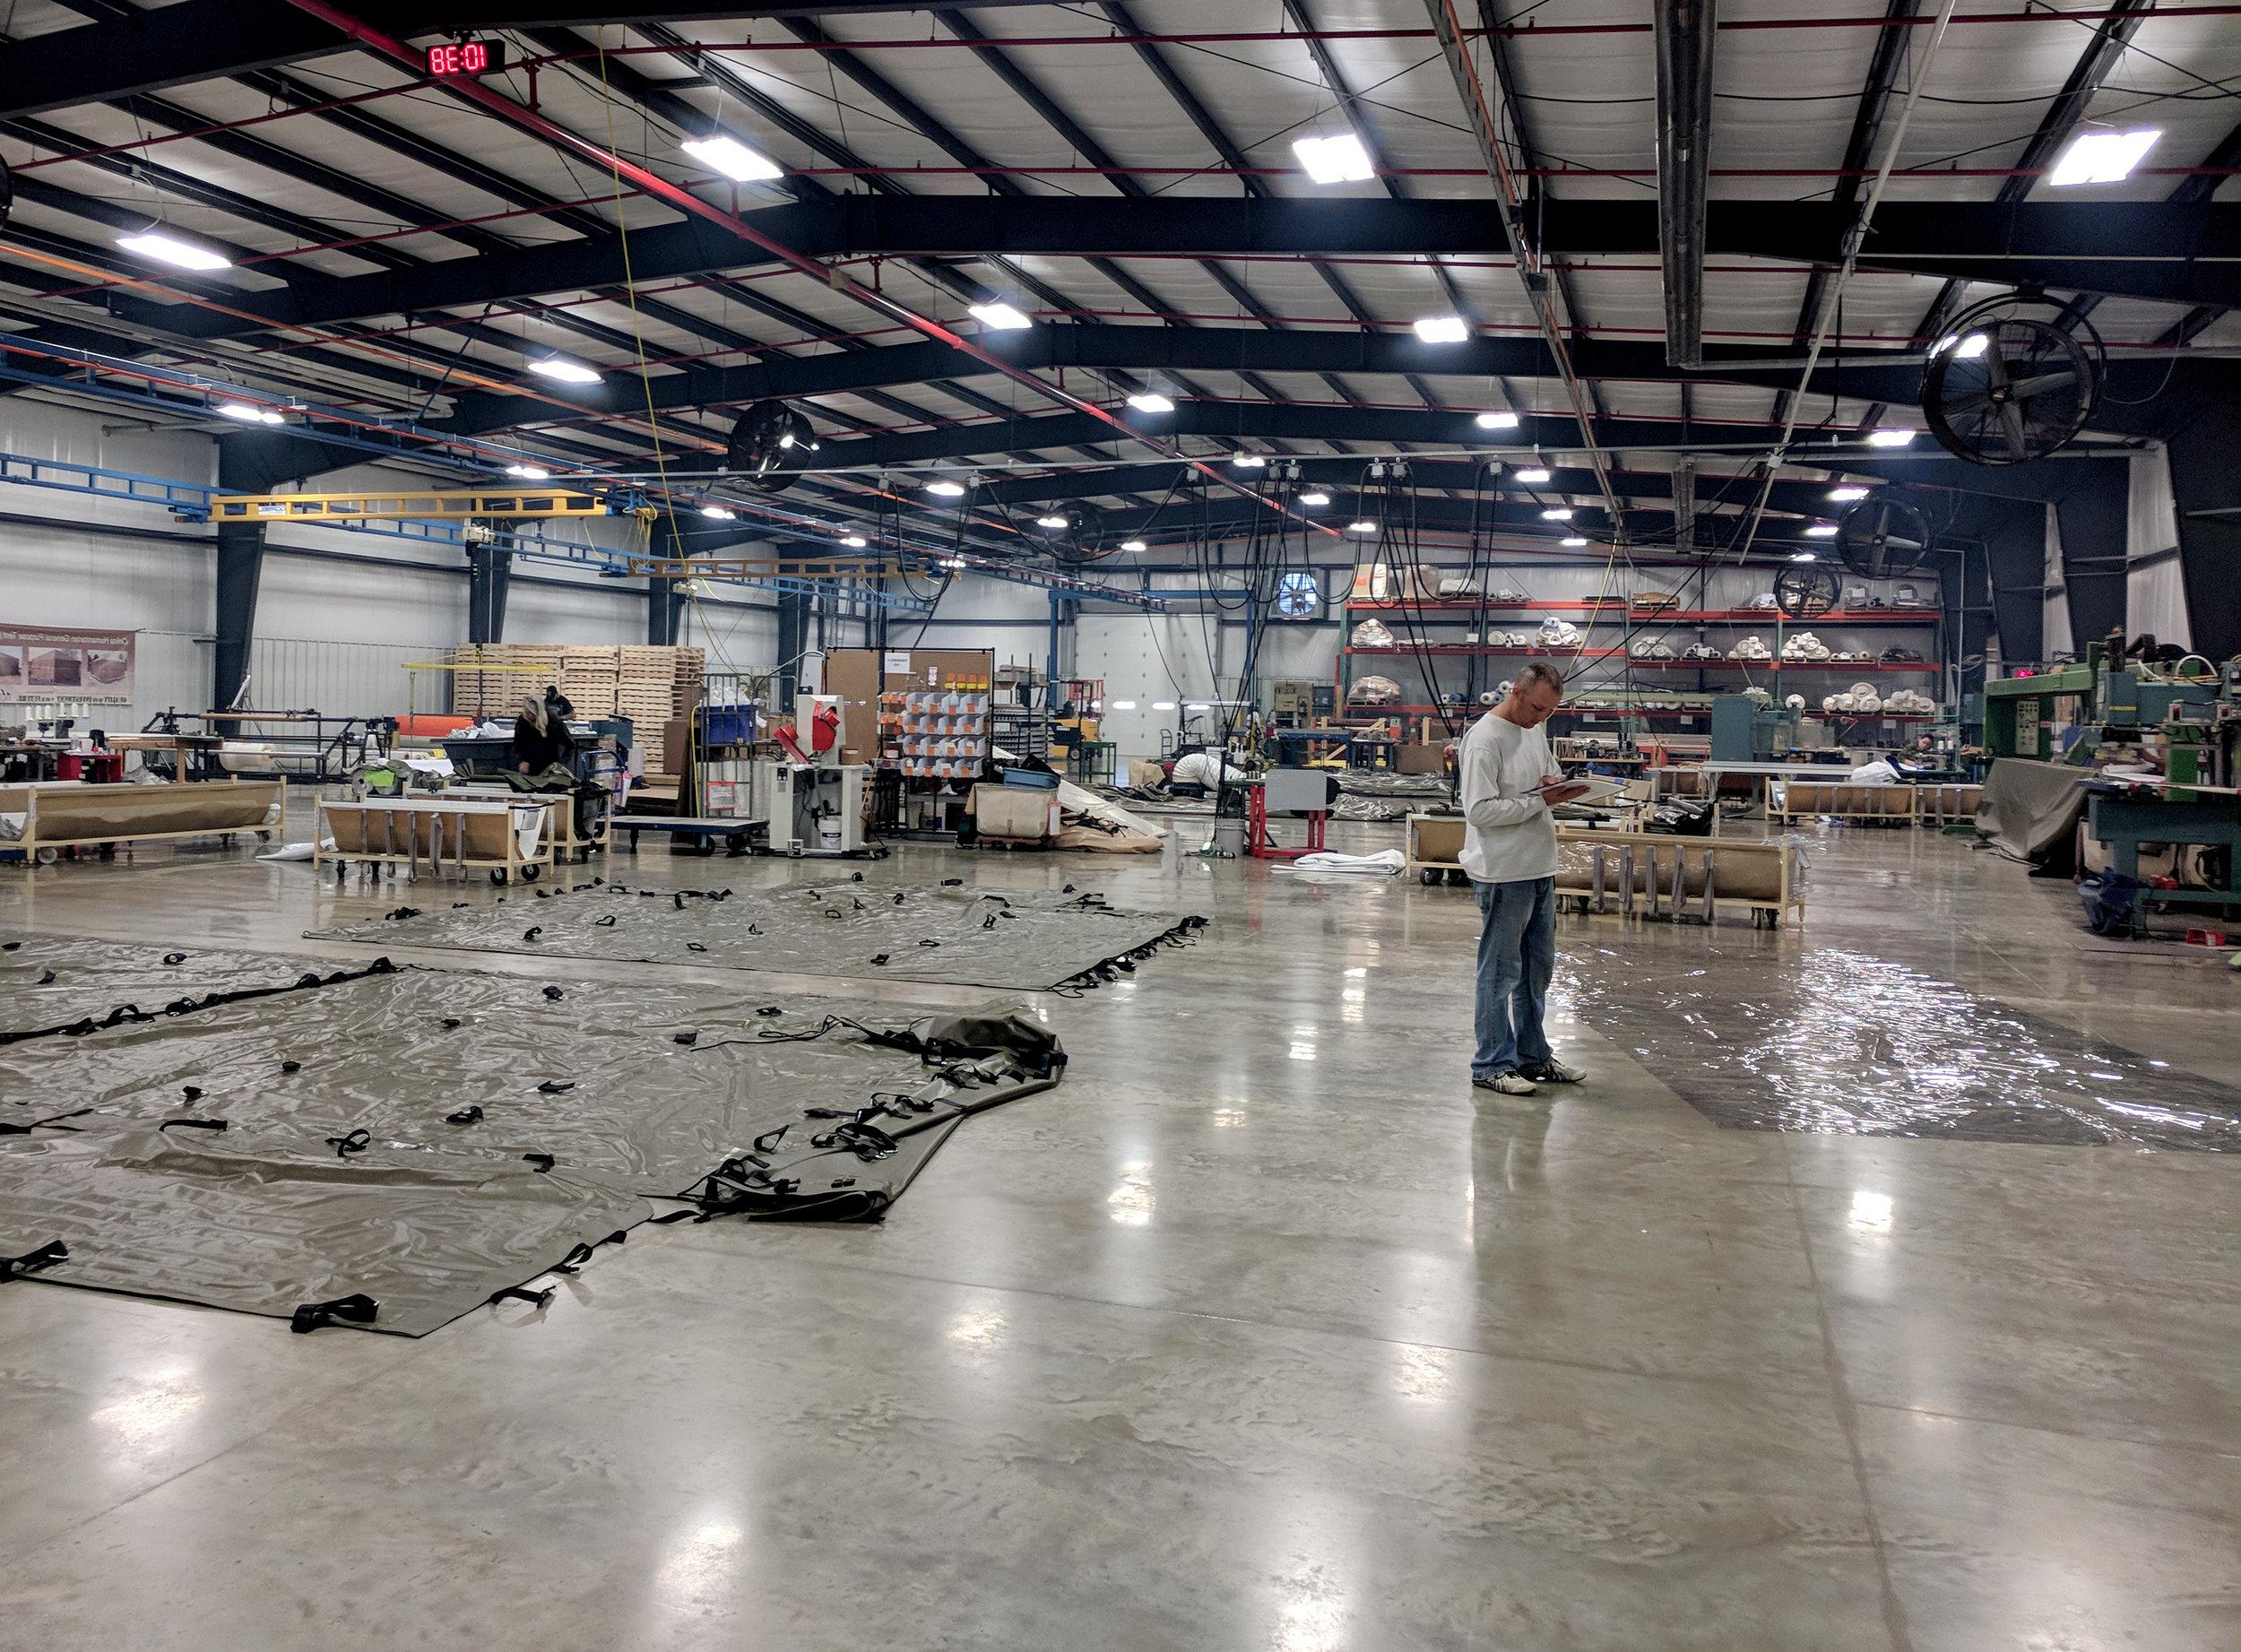 facility_celina_sew shop_production inspection_01.jpg